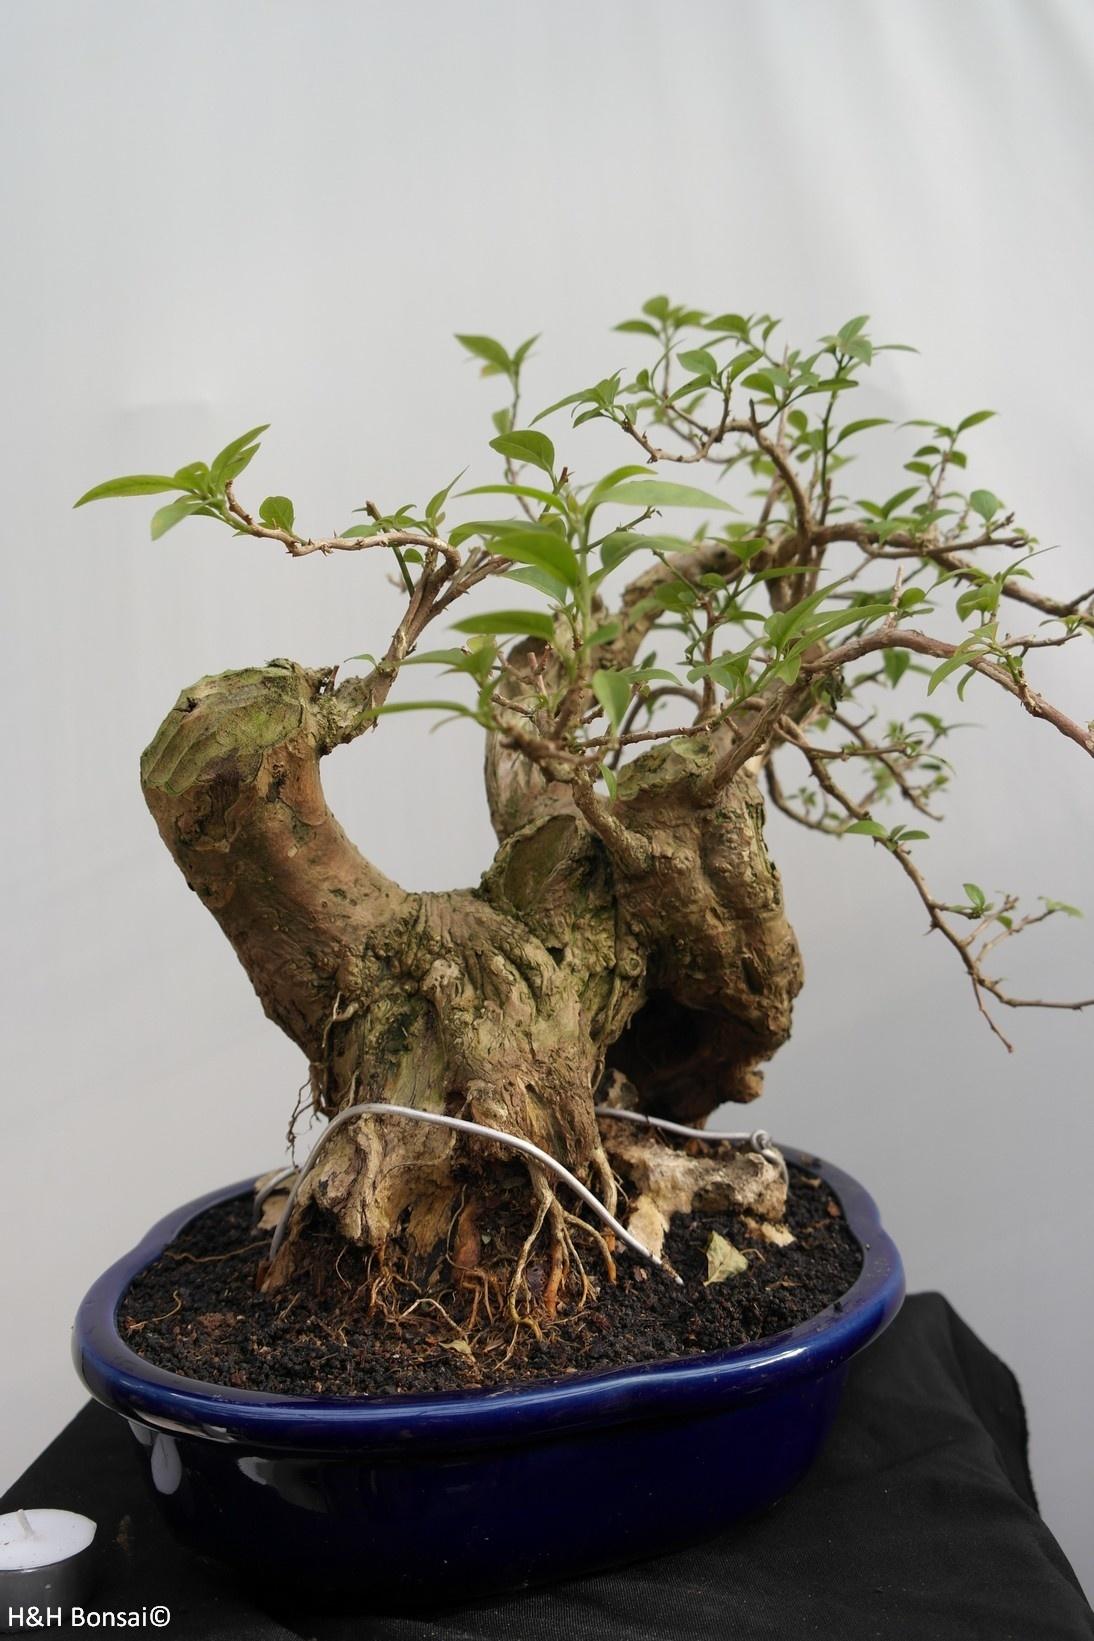 BonsaiBougainvillea glabra, nr. 7816